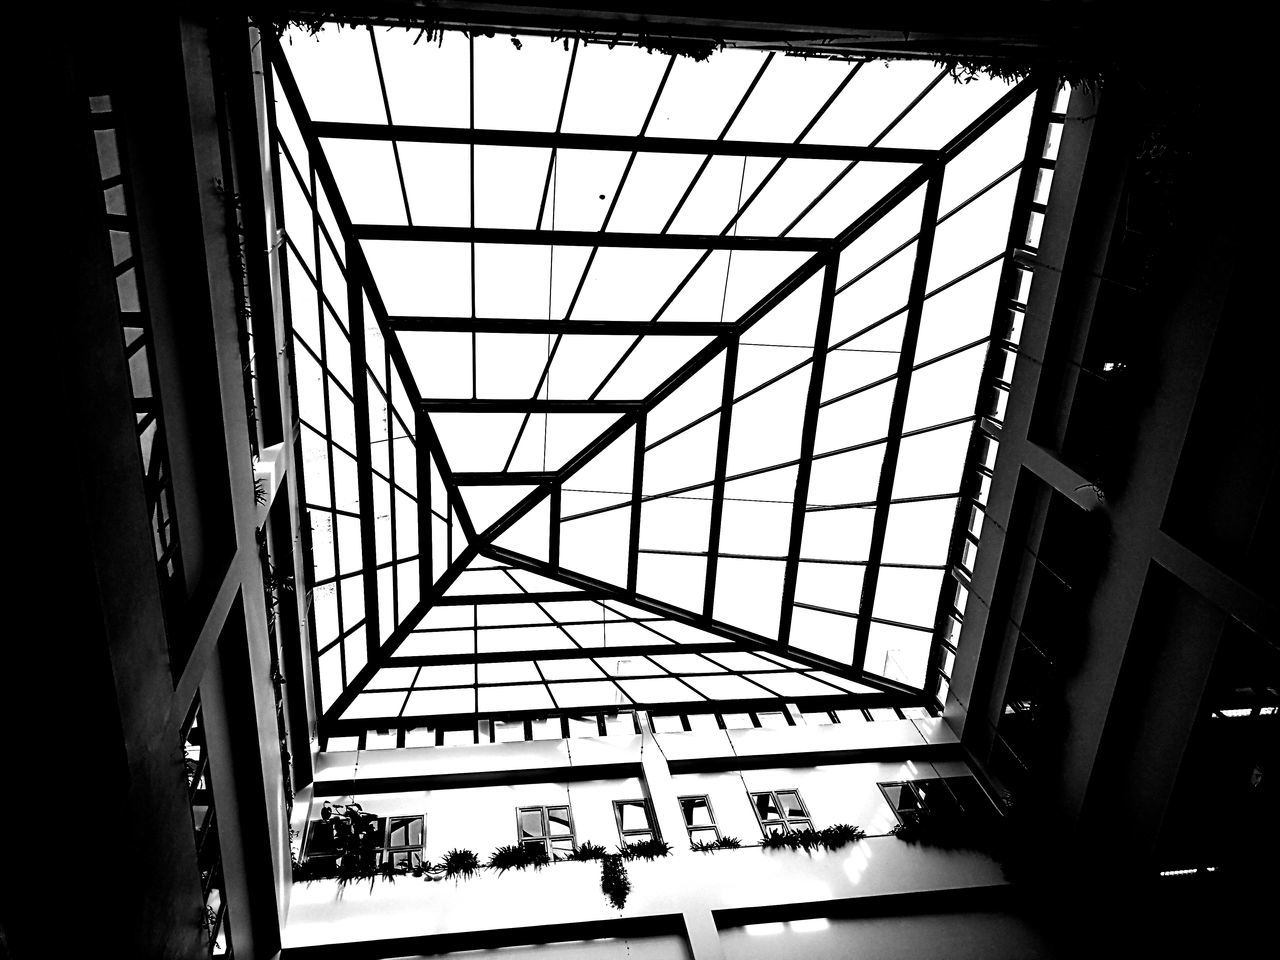 Cúpula do Edifício de S. Jerónimo nos Hospitais da Universidade de Coimbra Architecture Indoors  Black & White Buildingstyles